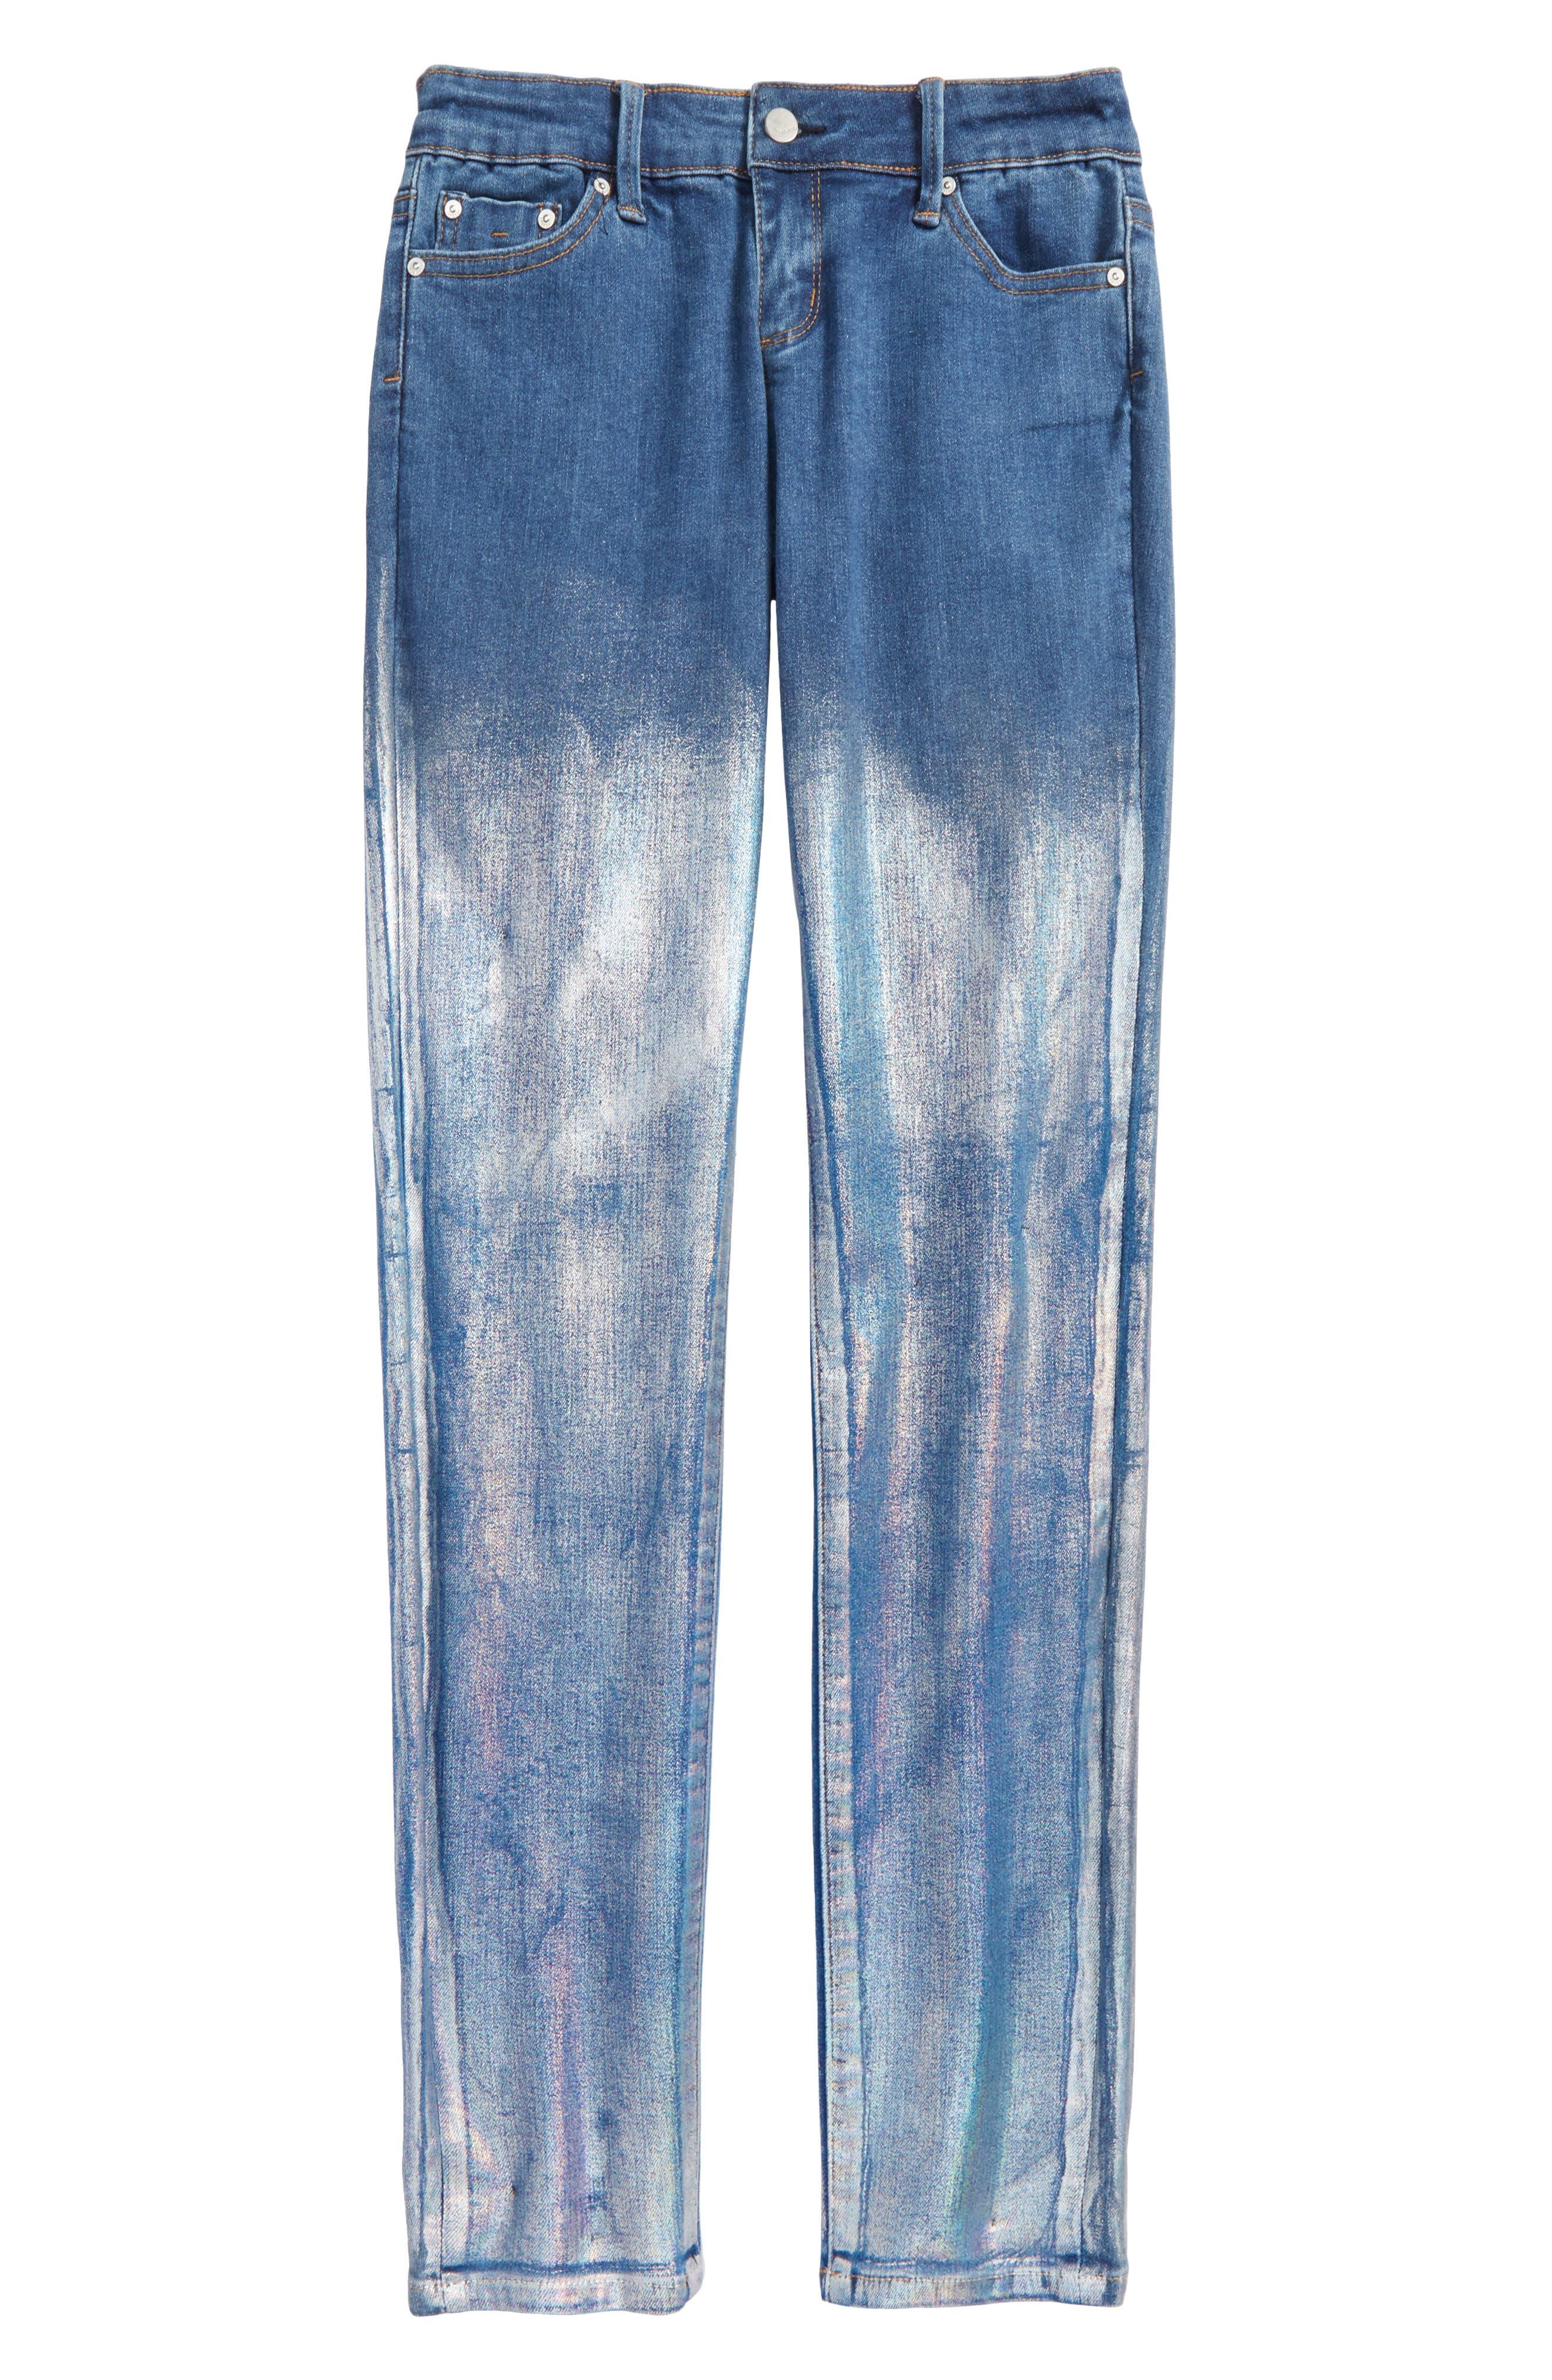 Tractr Chameleon Foil Skinny Jeans (Big Girls)